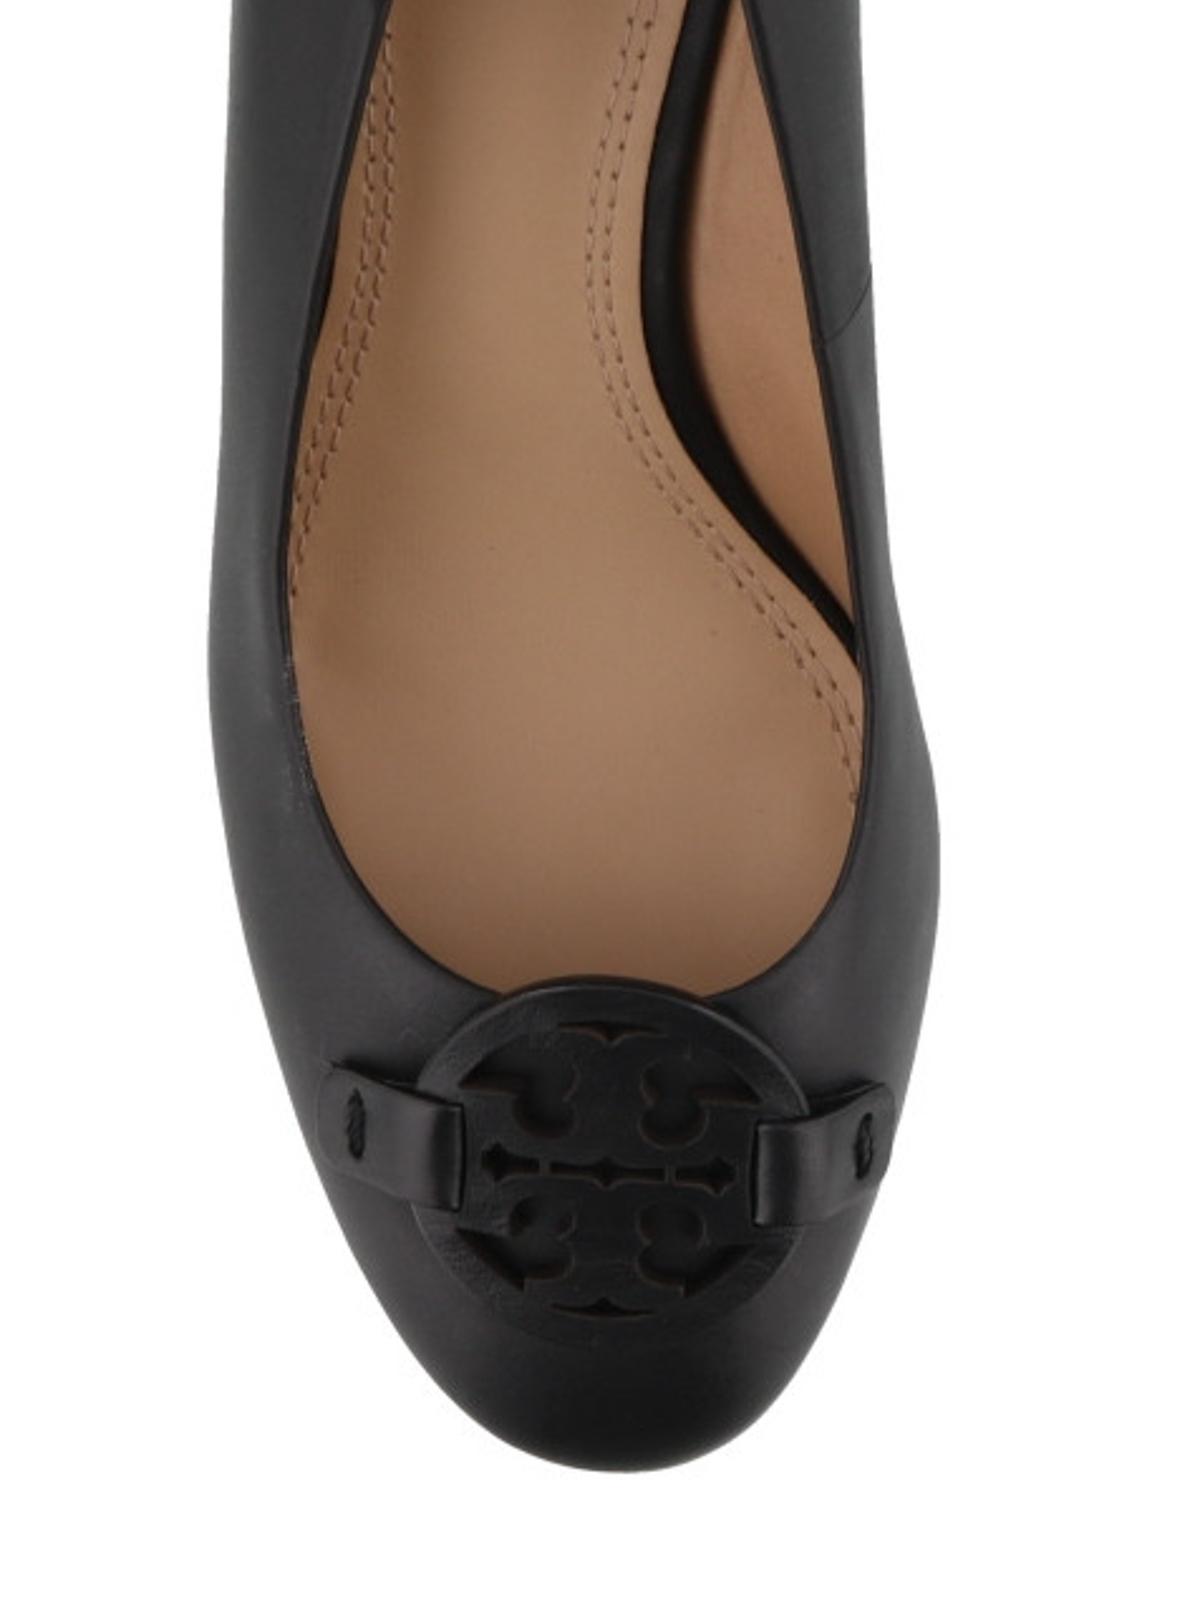 Tory Burch - Chaussures À Talon - Miller - Escarpins - 40296 001 96213f7cb67b